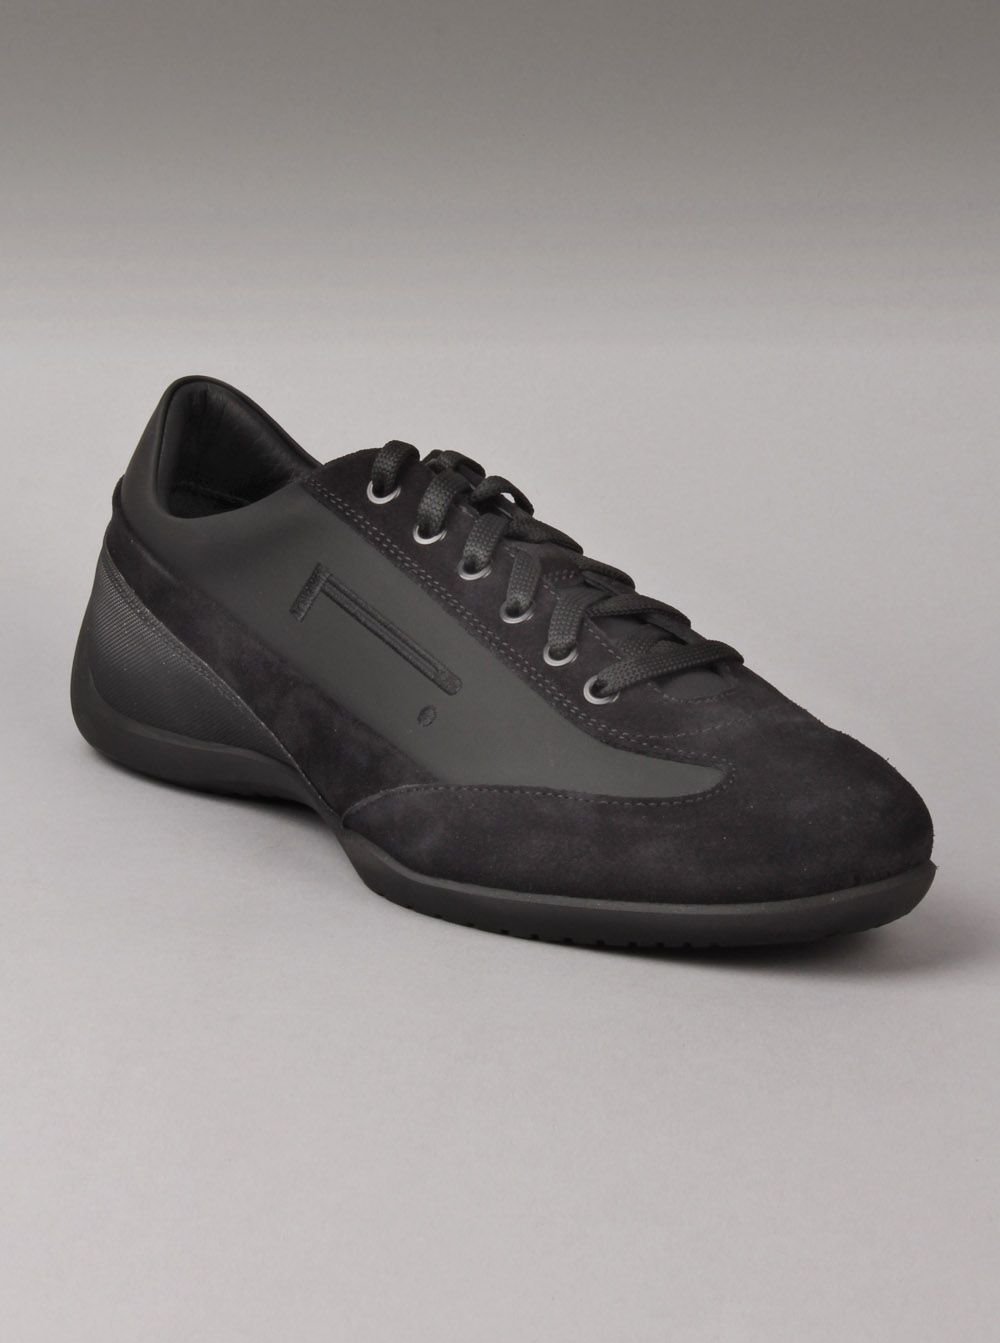 louboutin Sneakers Marina Militare